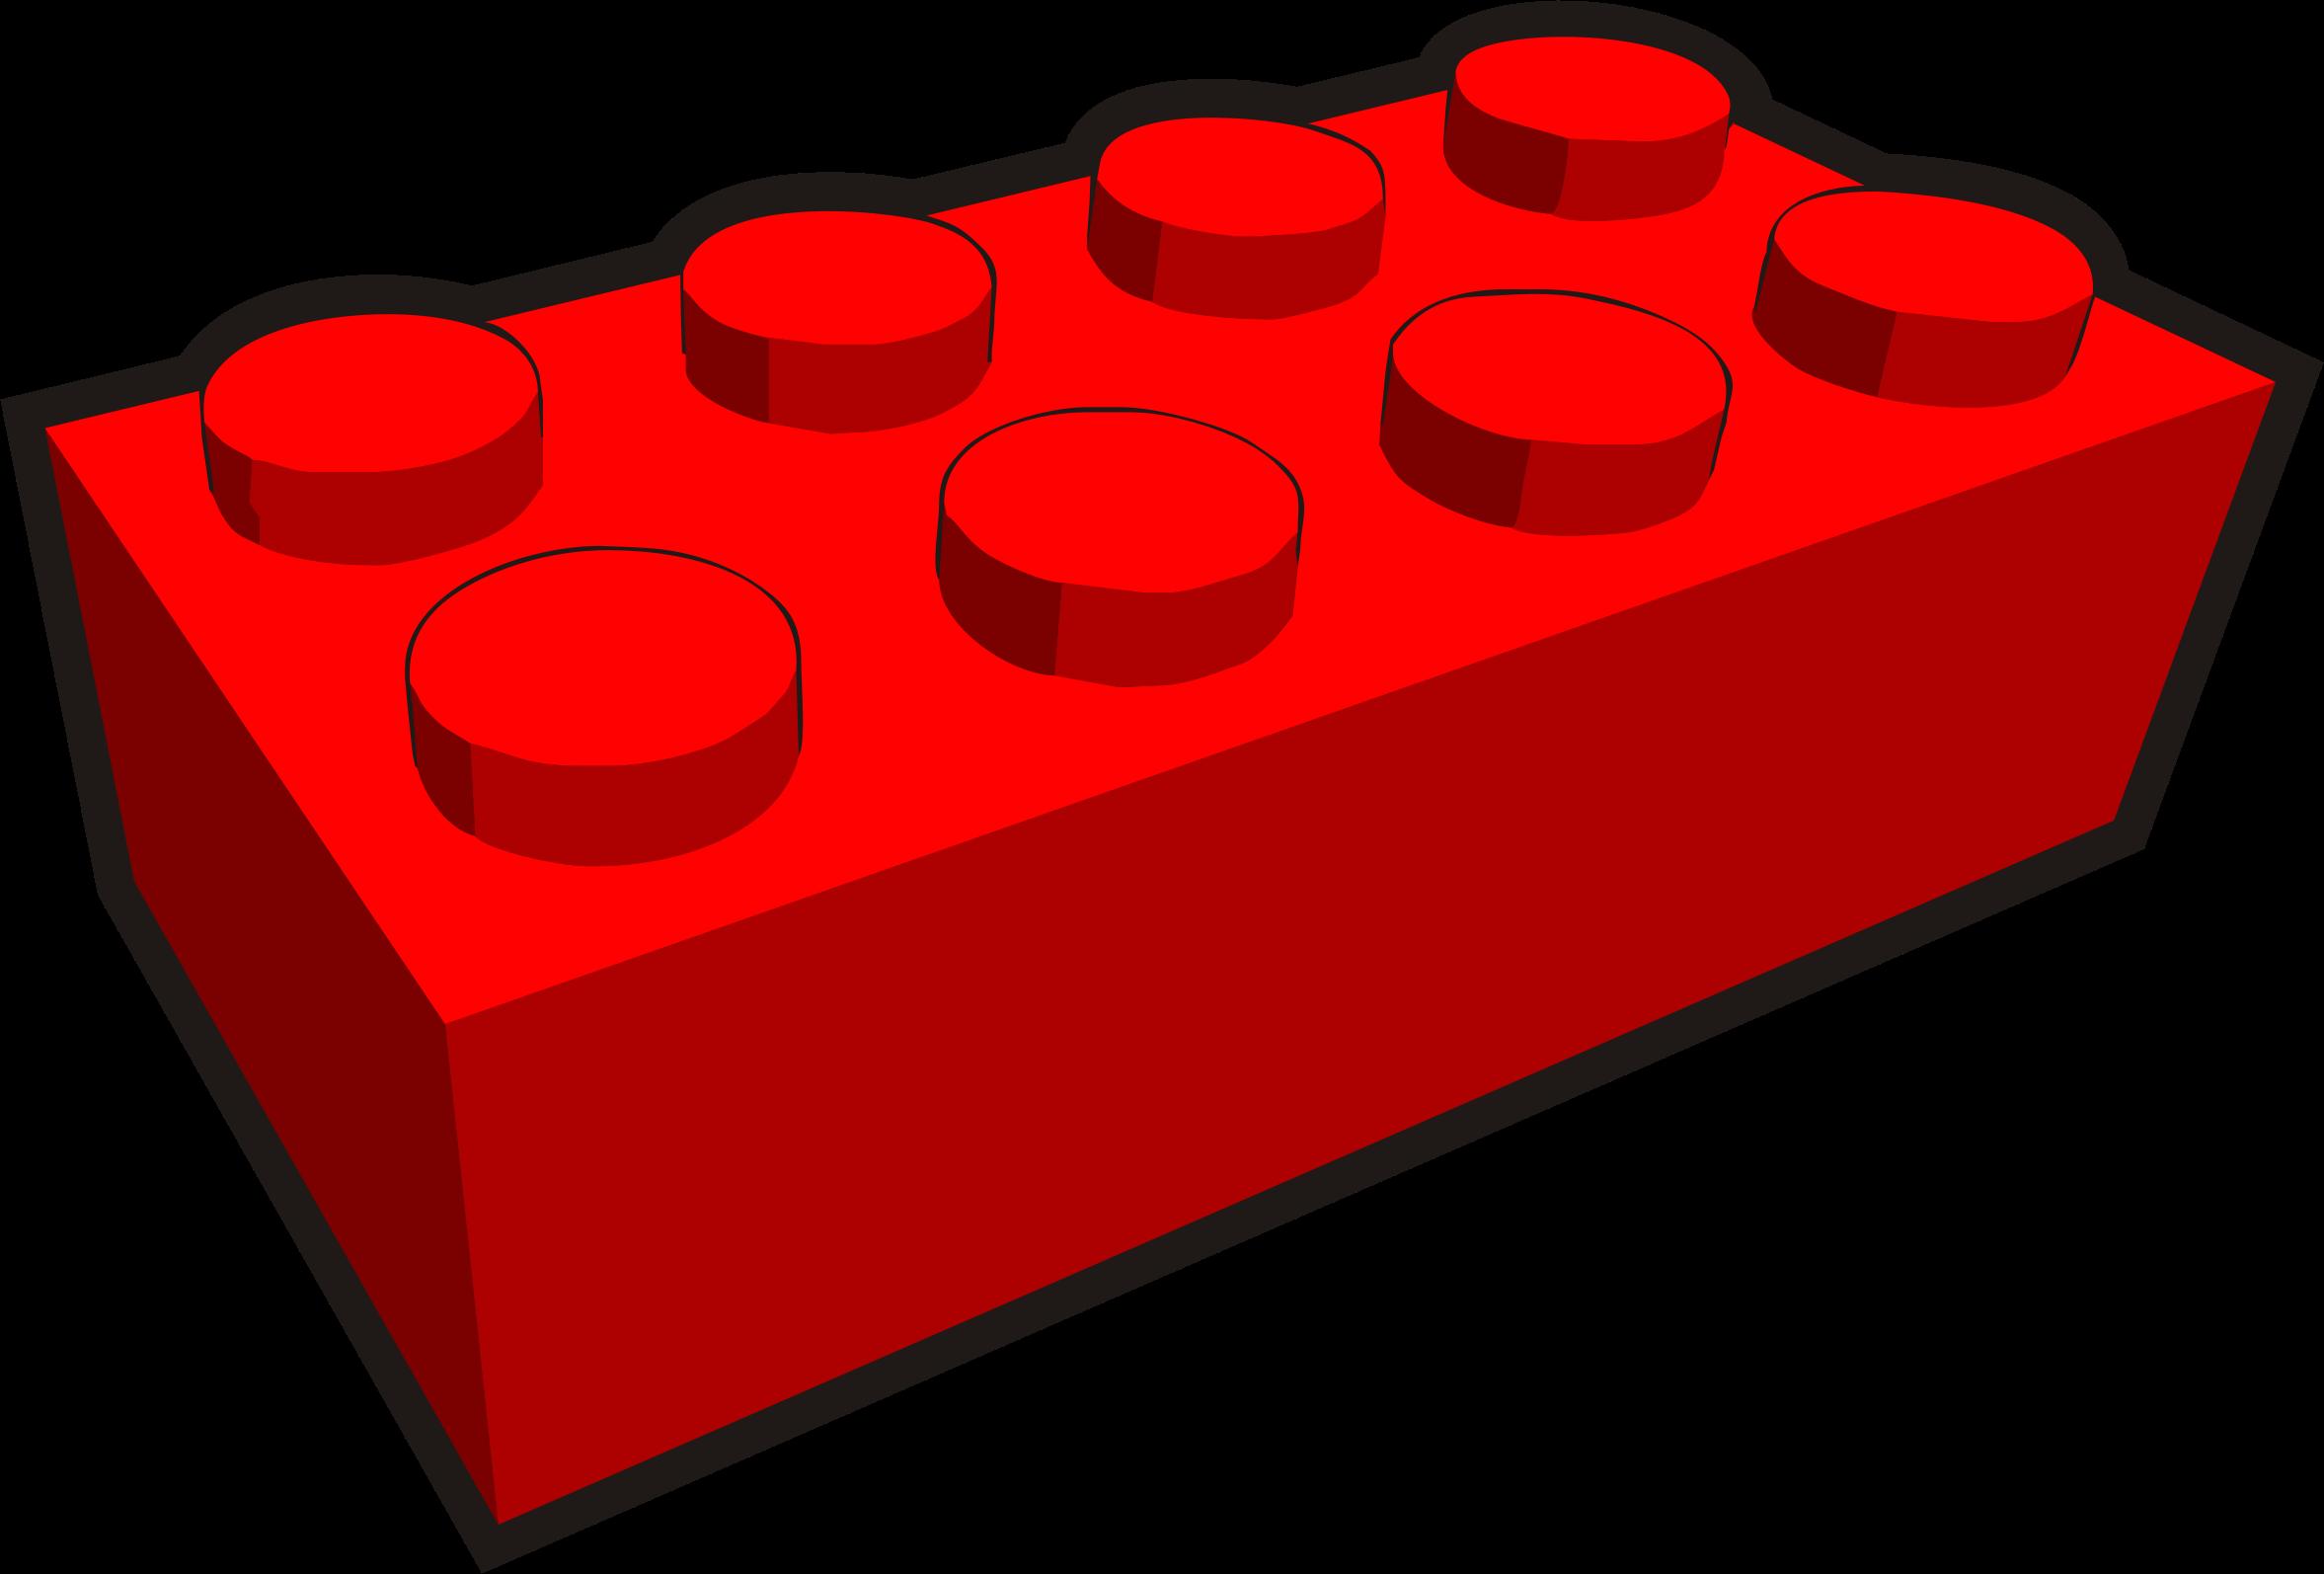 2354x1594 2x4 Lego Brick Clipart